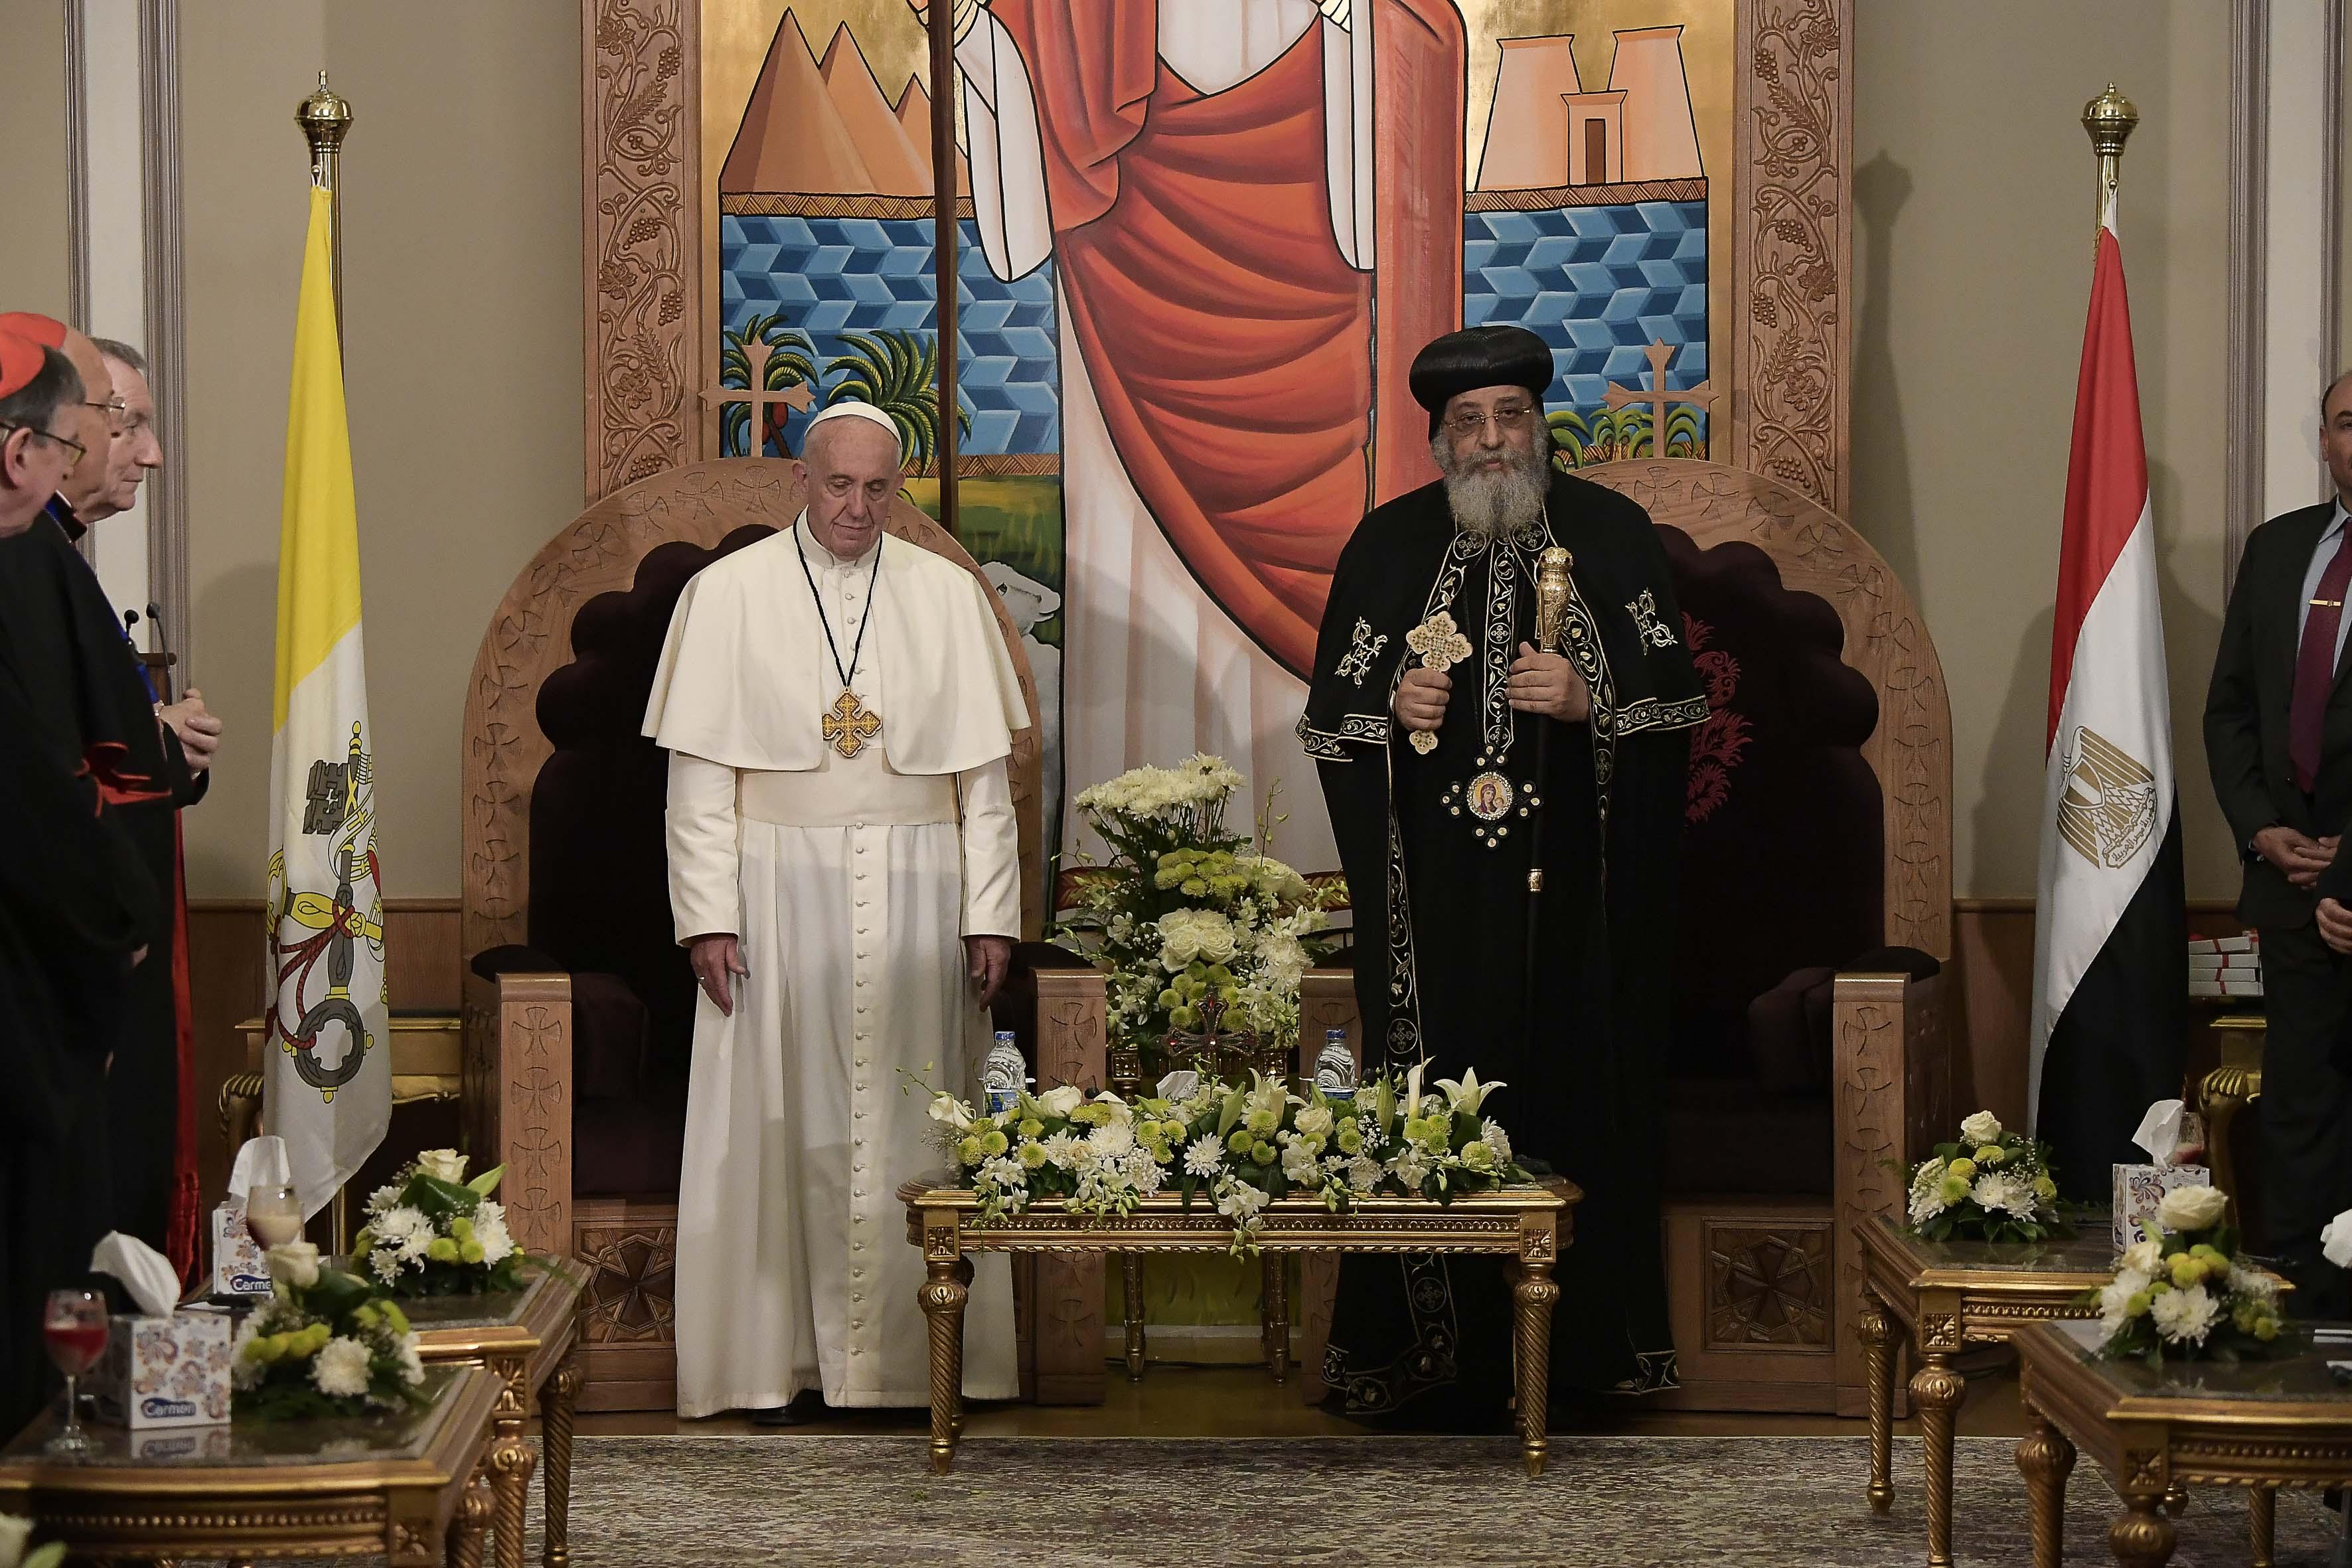 Le pape et le patriarche Tawadros © L'Osservatore Romano